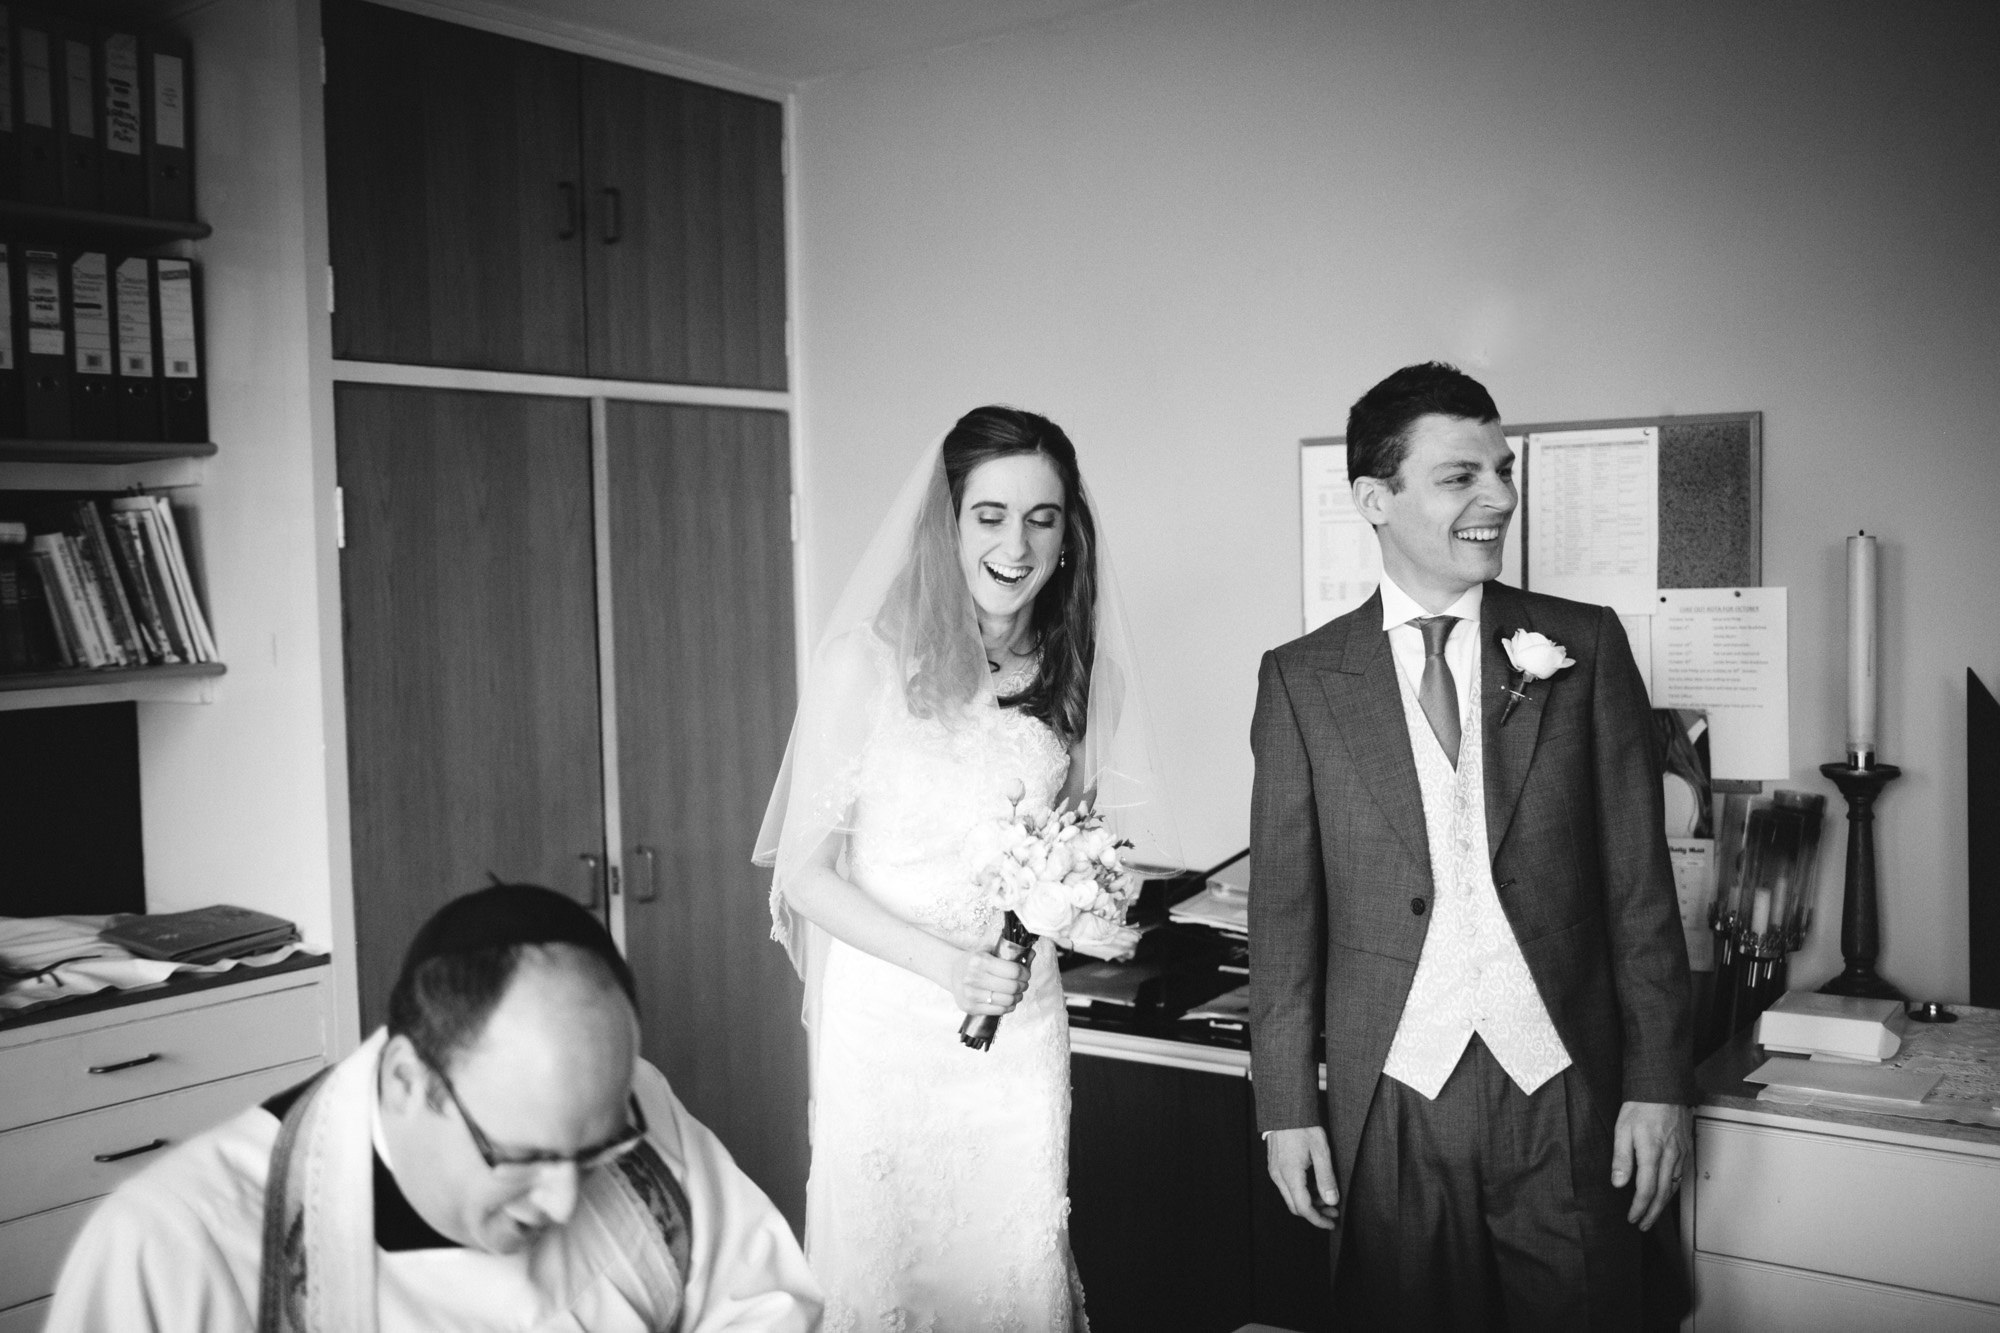 cambridge-wedding-photographer-io-1583-141-2.jpg